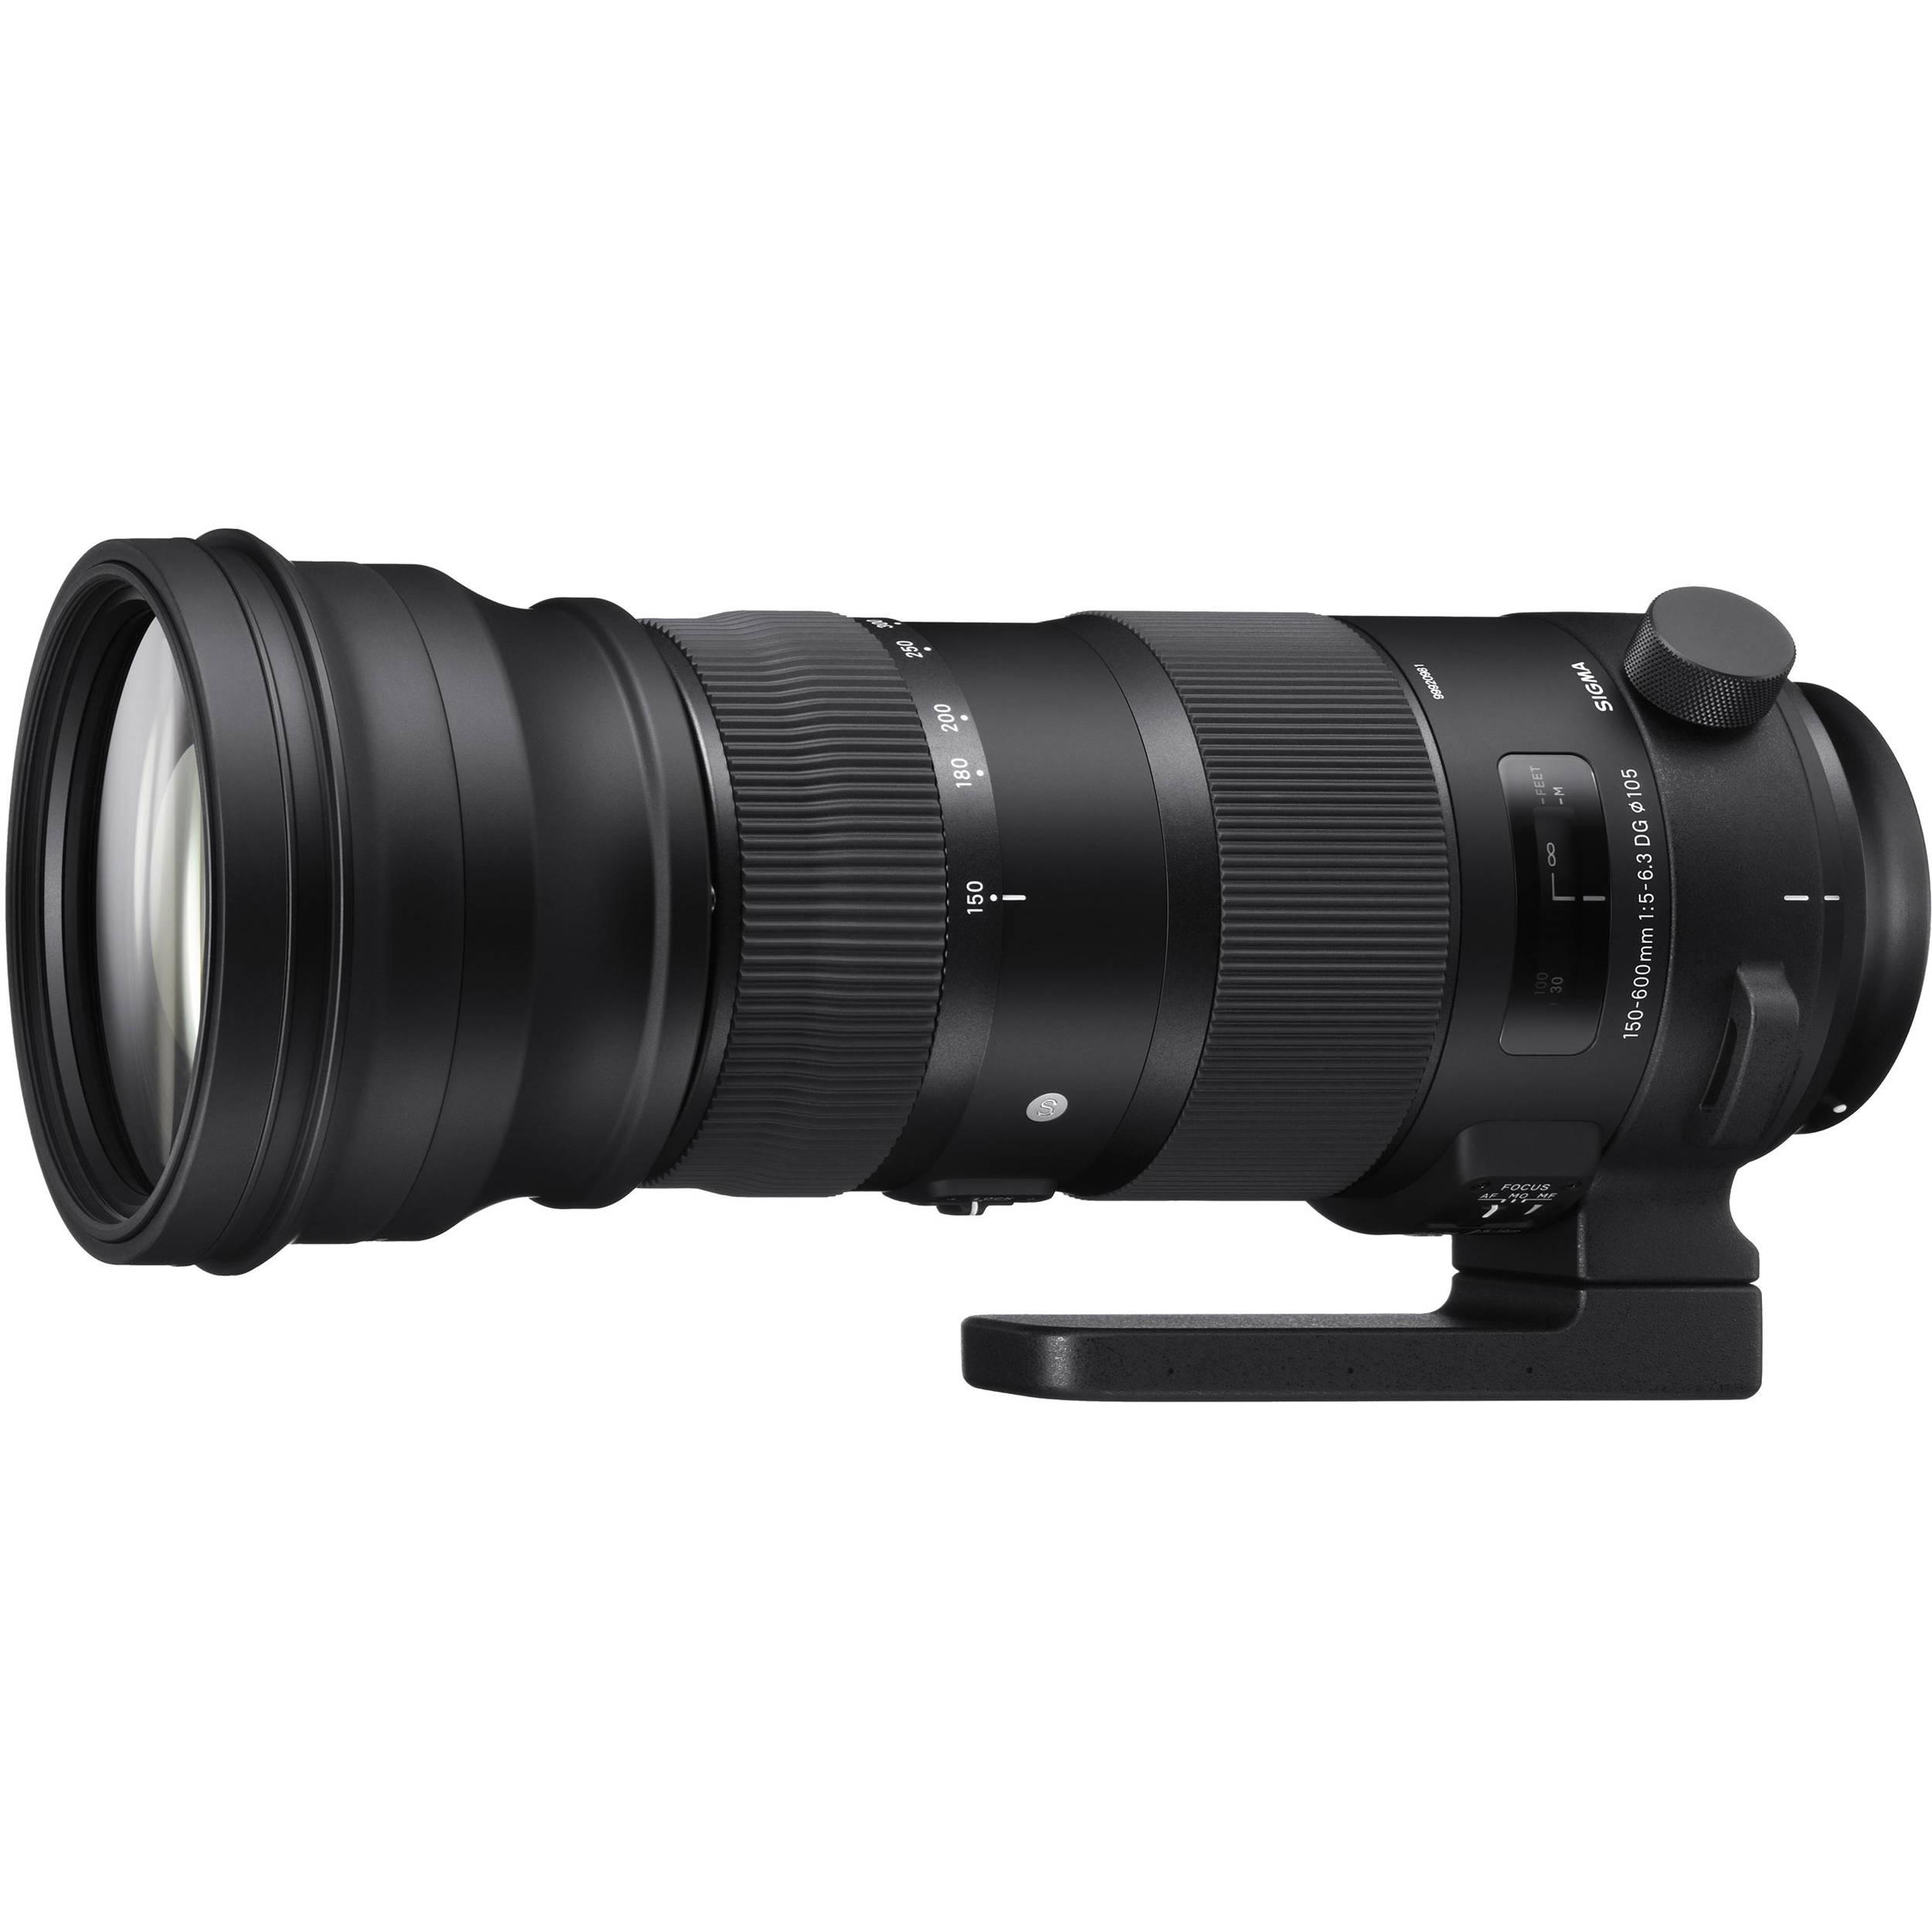 Sigma 150-600mm f/5-6.3 DG OS HSM | S